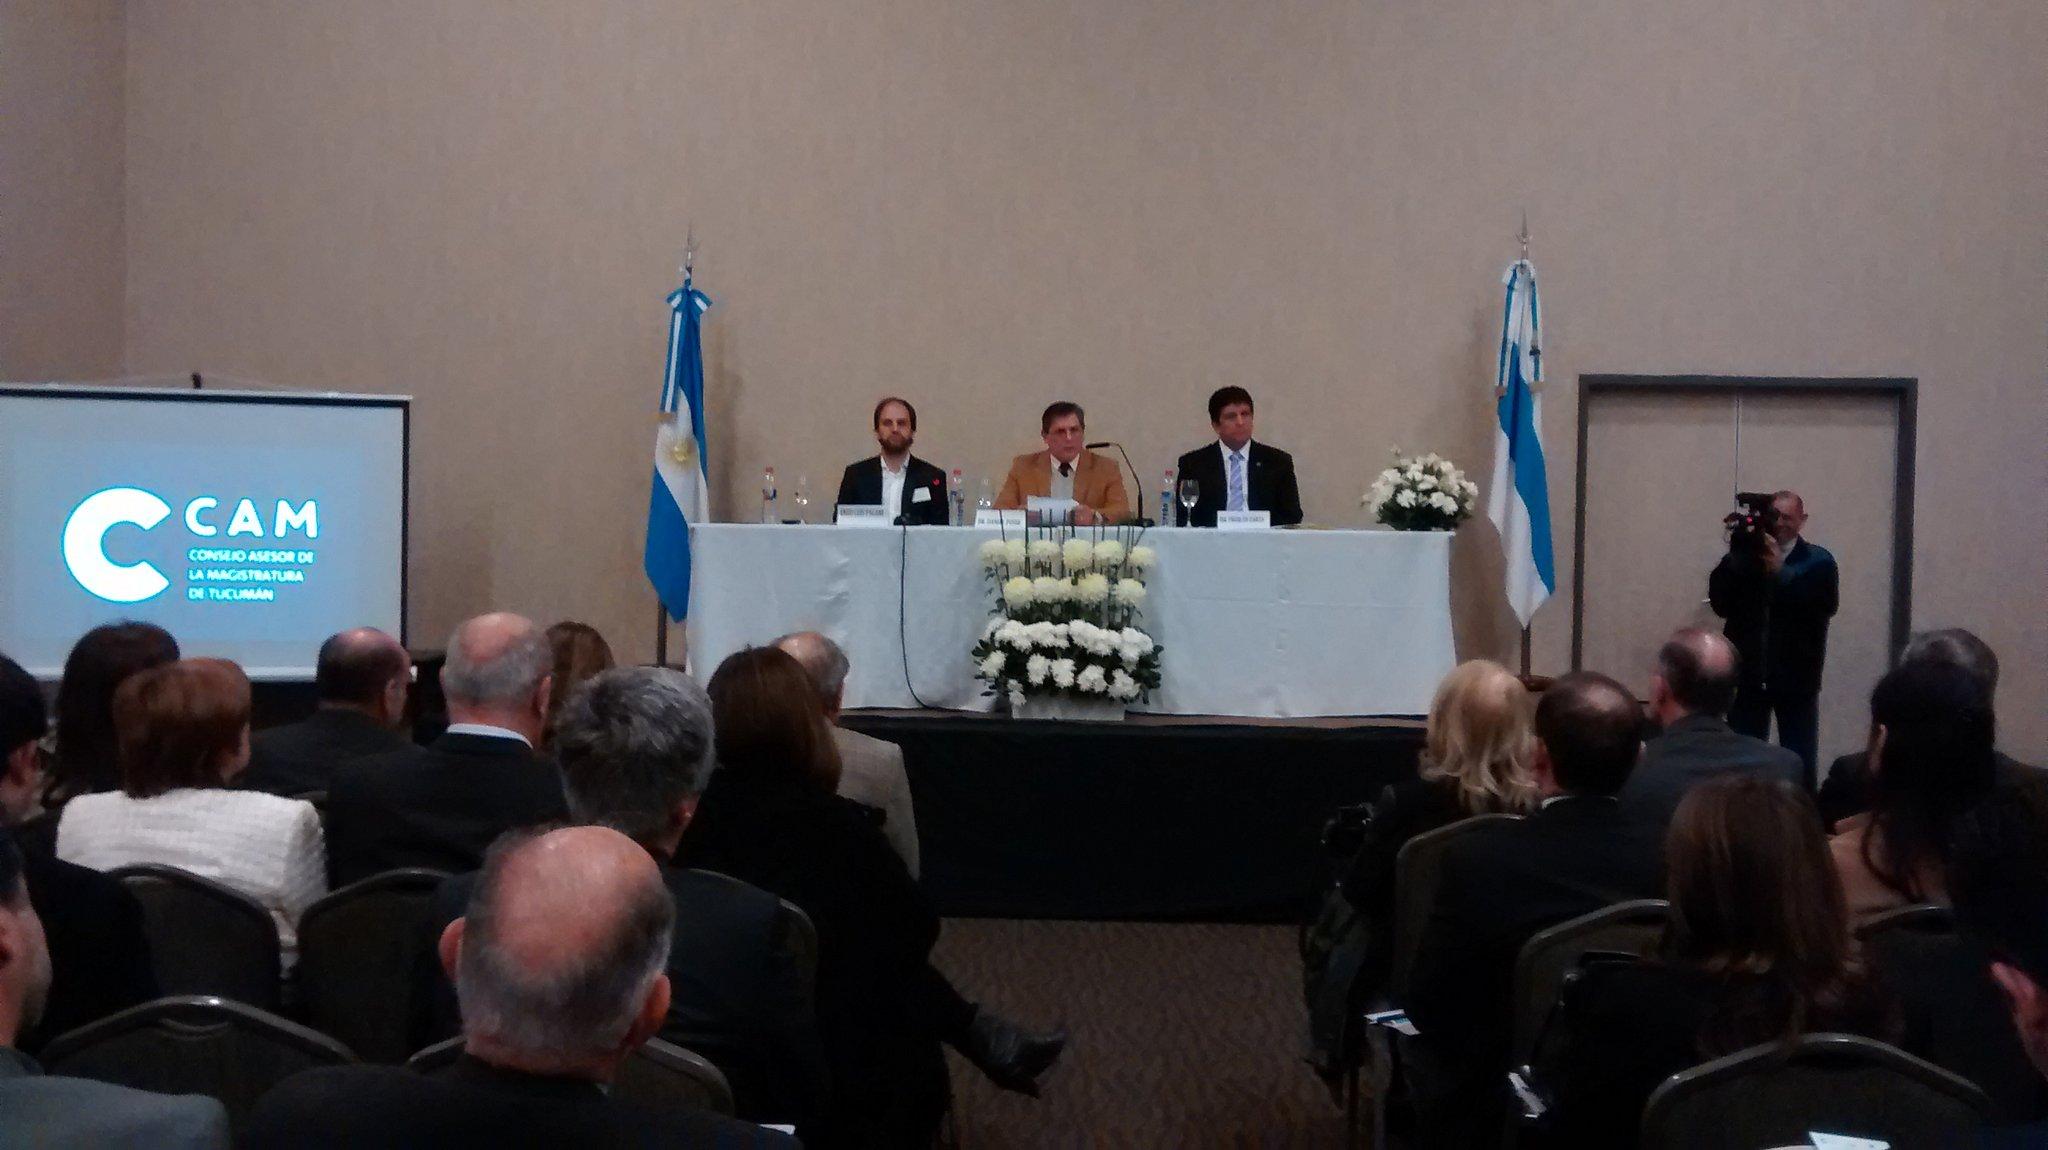 Dr. Posse presidente del CAM da inicio a las XVII Jornadas Nacionales del @fofecma https://t.co/LuuB7AmiUl